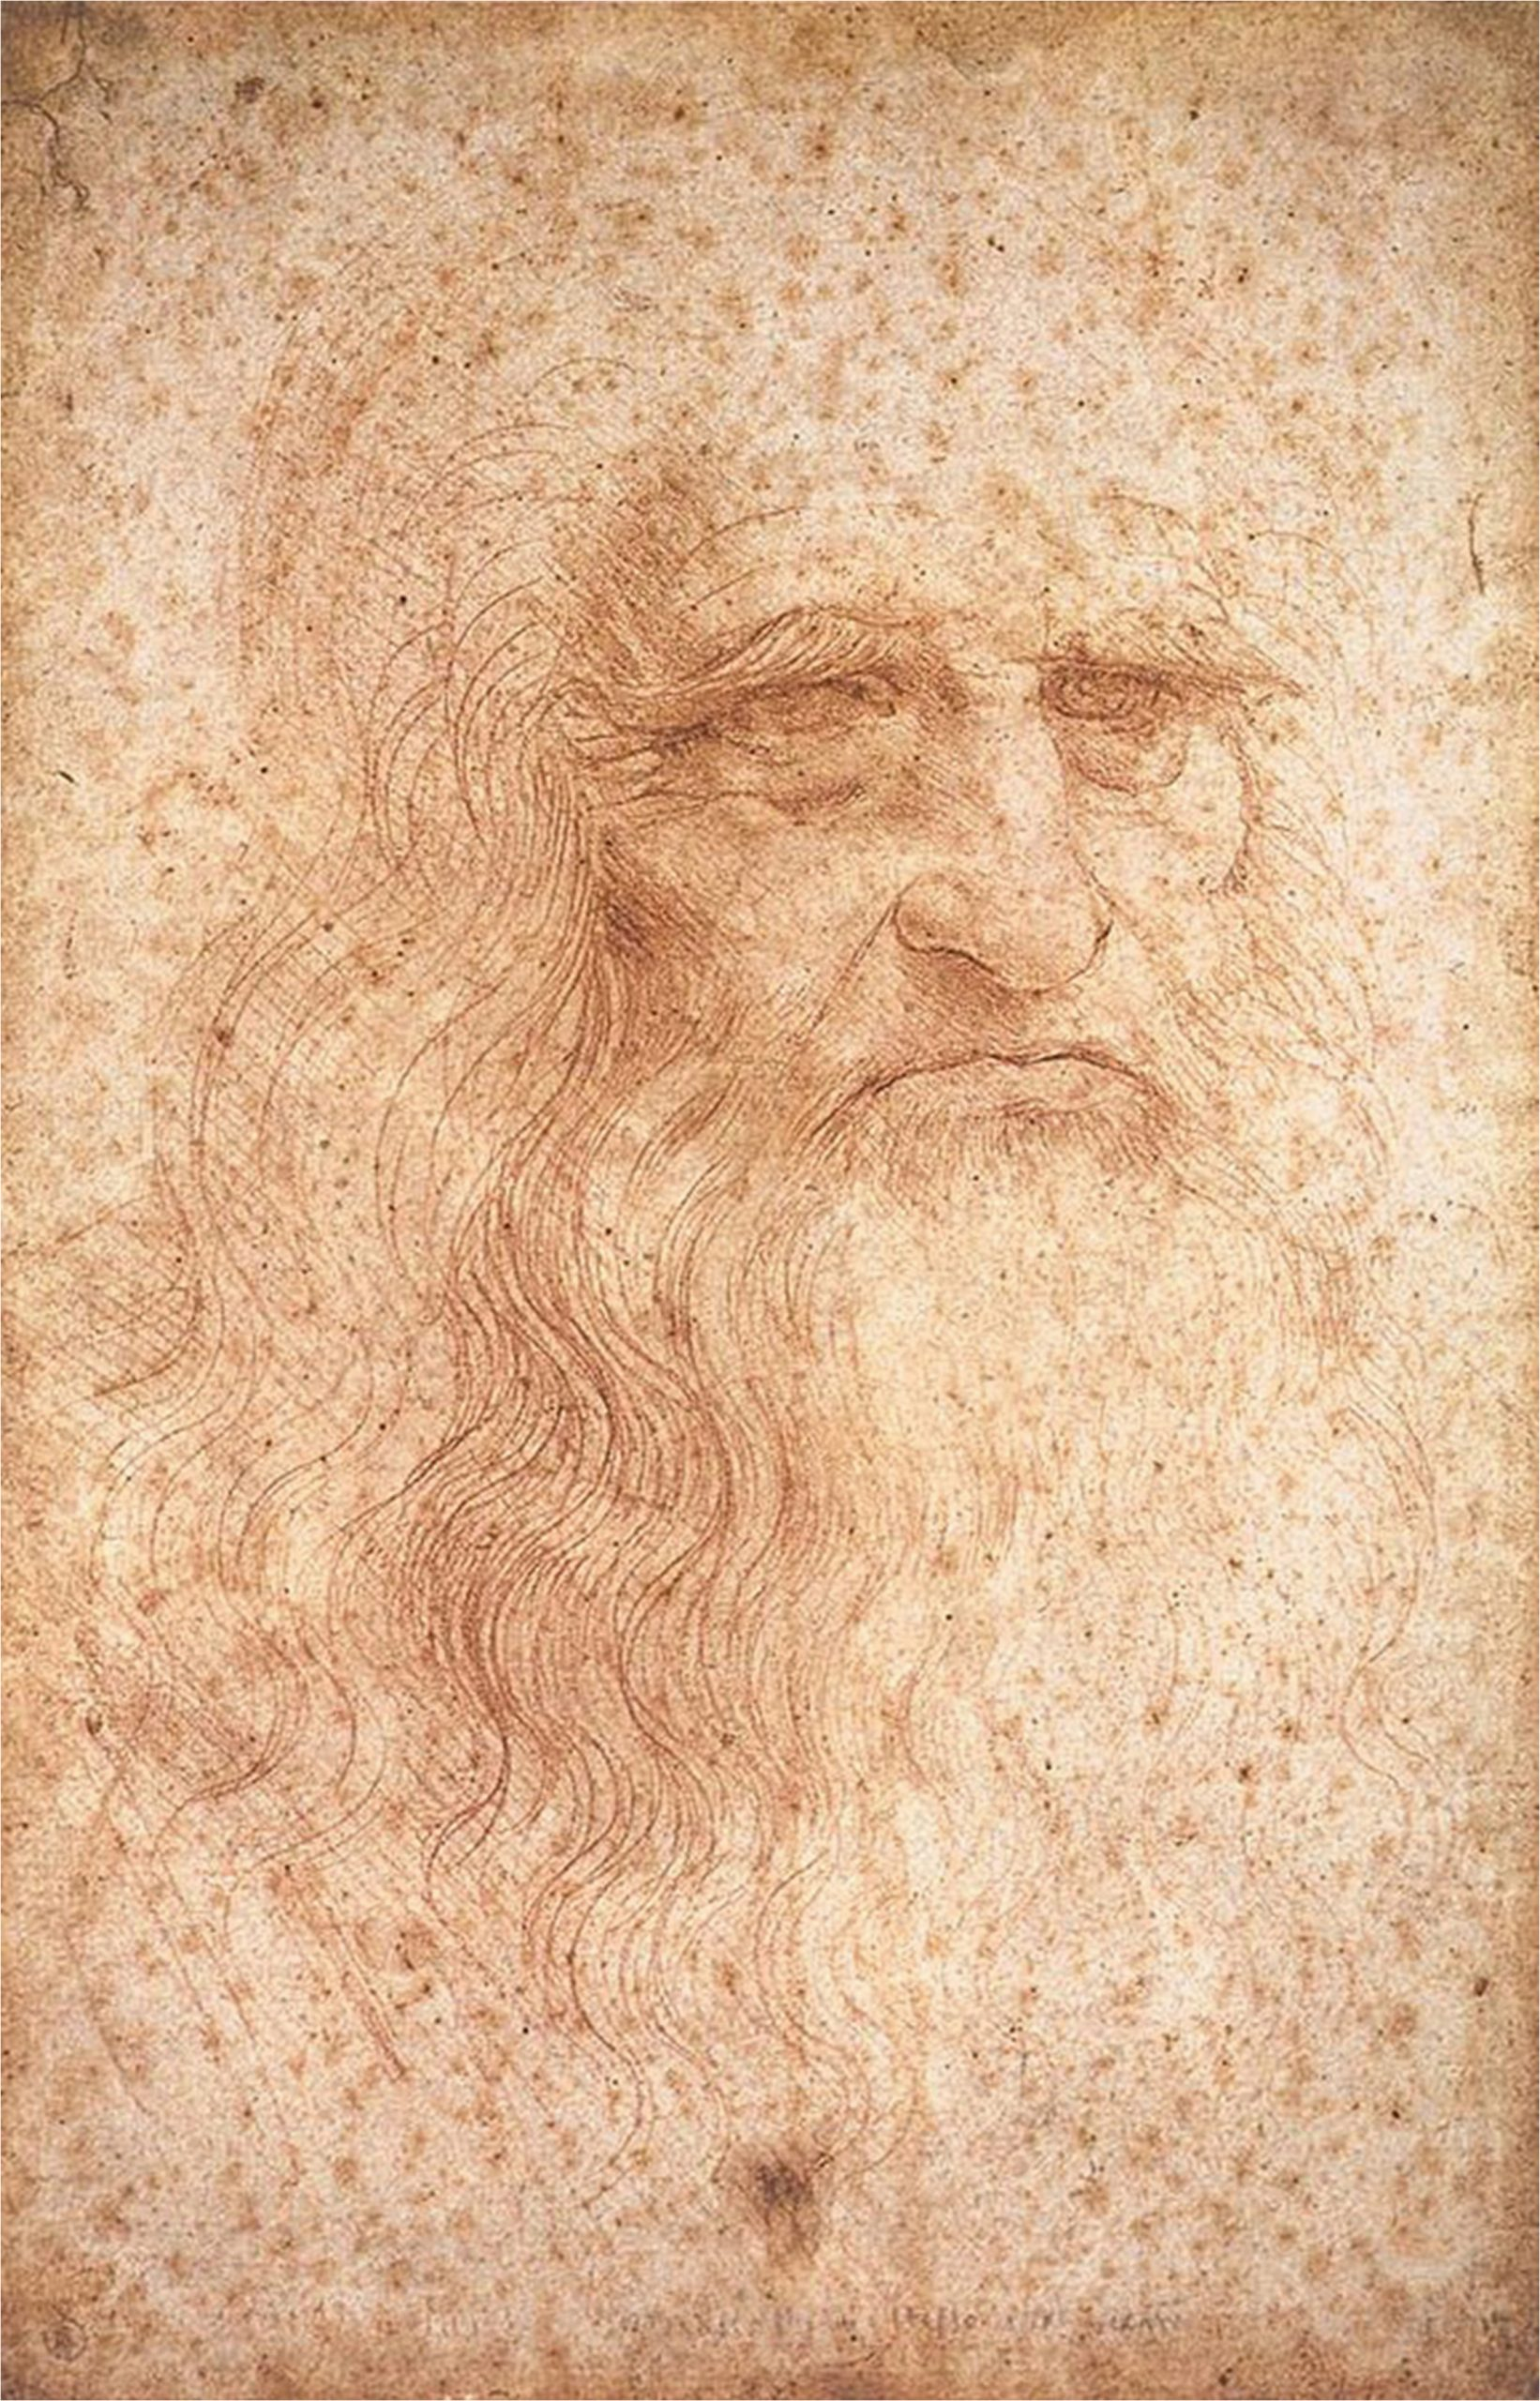 Leonardo Da Vinci Deutsch Lebenslauf Leonardo Da Vinci –